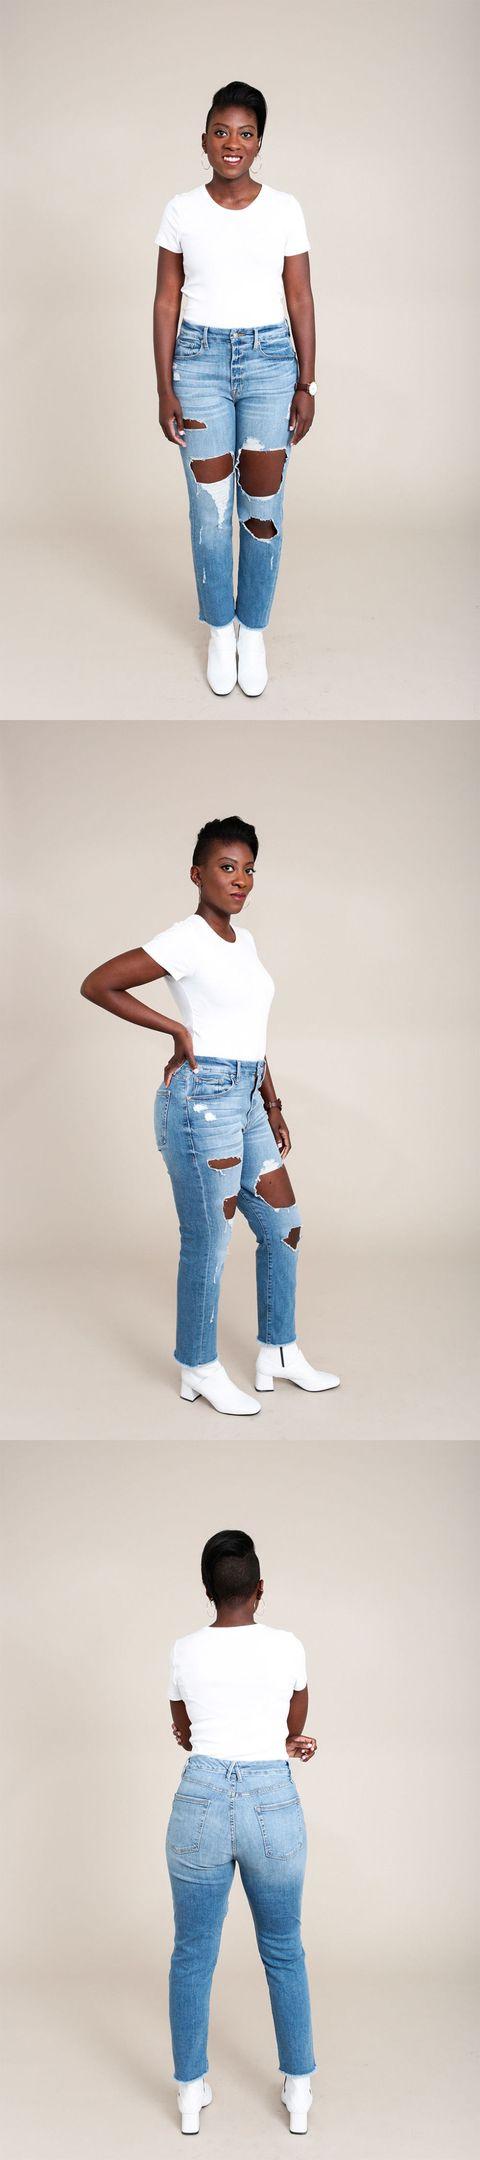 bd1d65039061 Khloe Kardashian Good American Jeans Review - Real Women Try Khloe ...